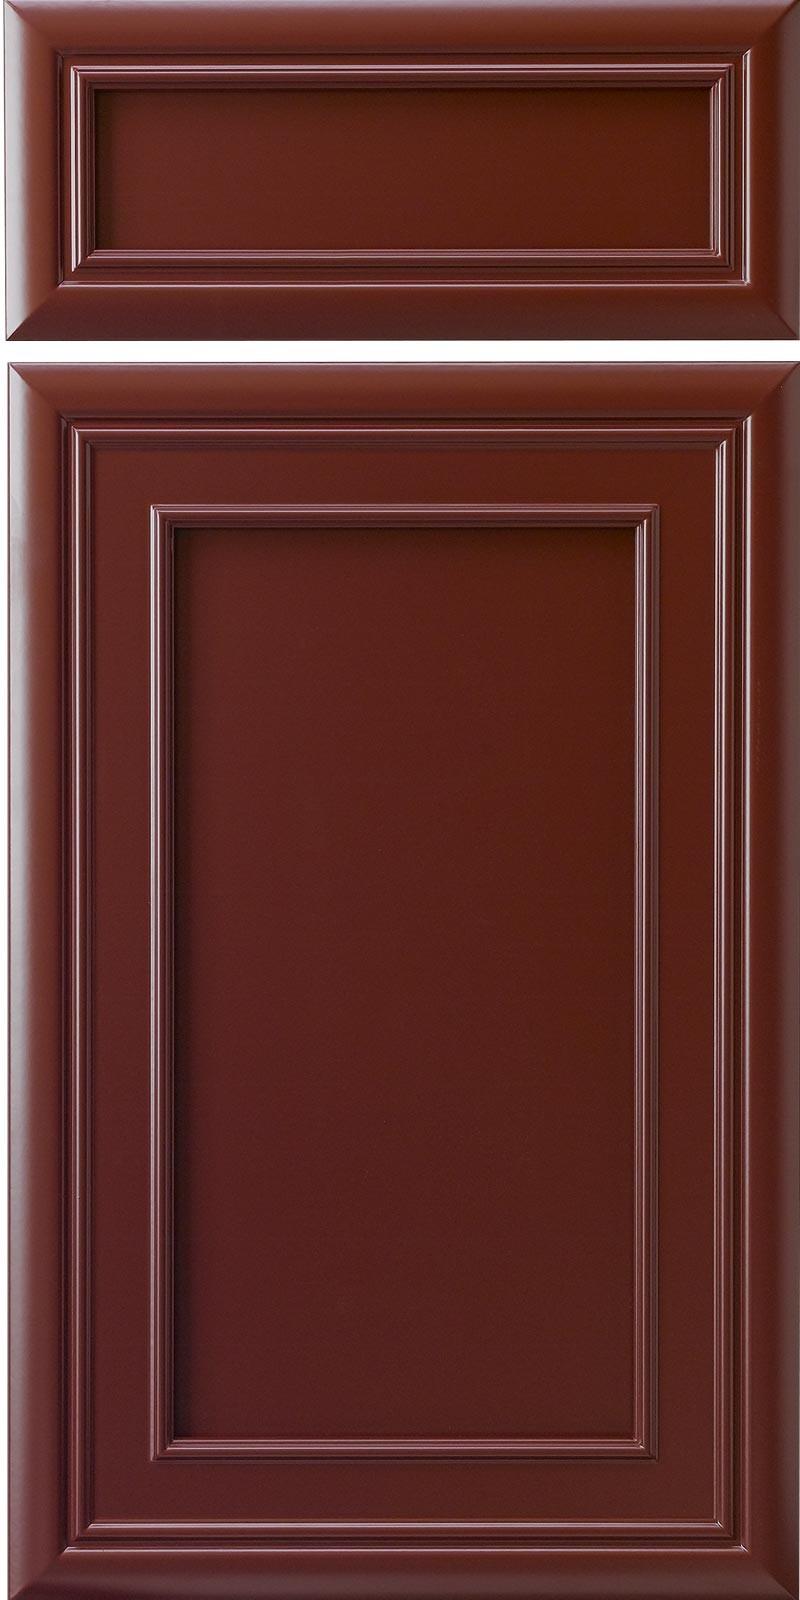 Crp medium density fiberboard materials cabinet